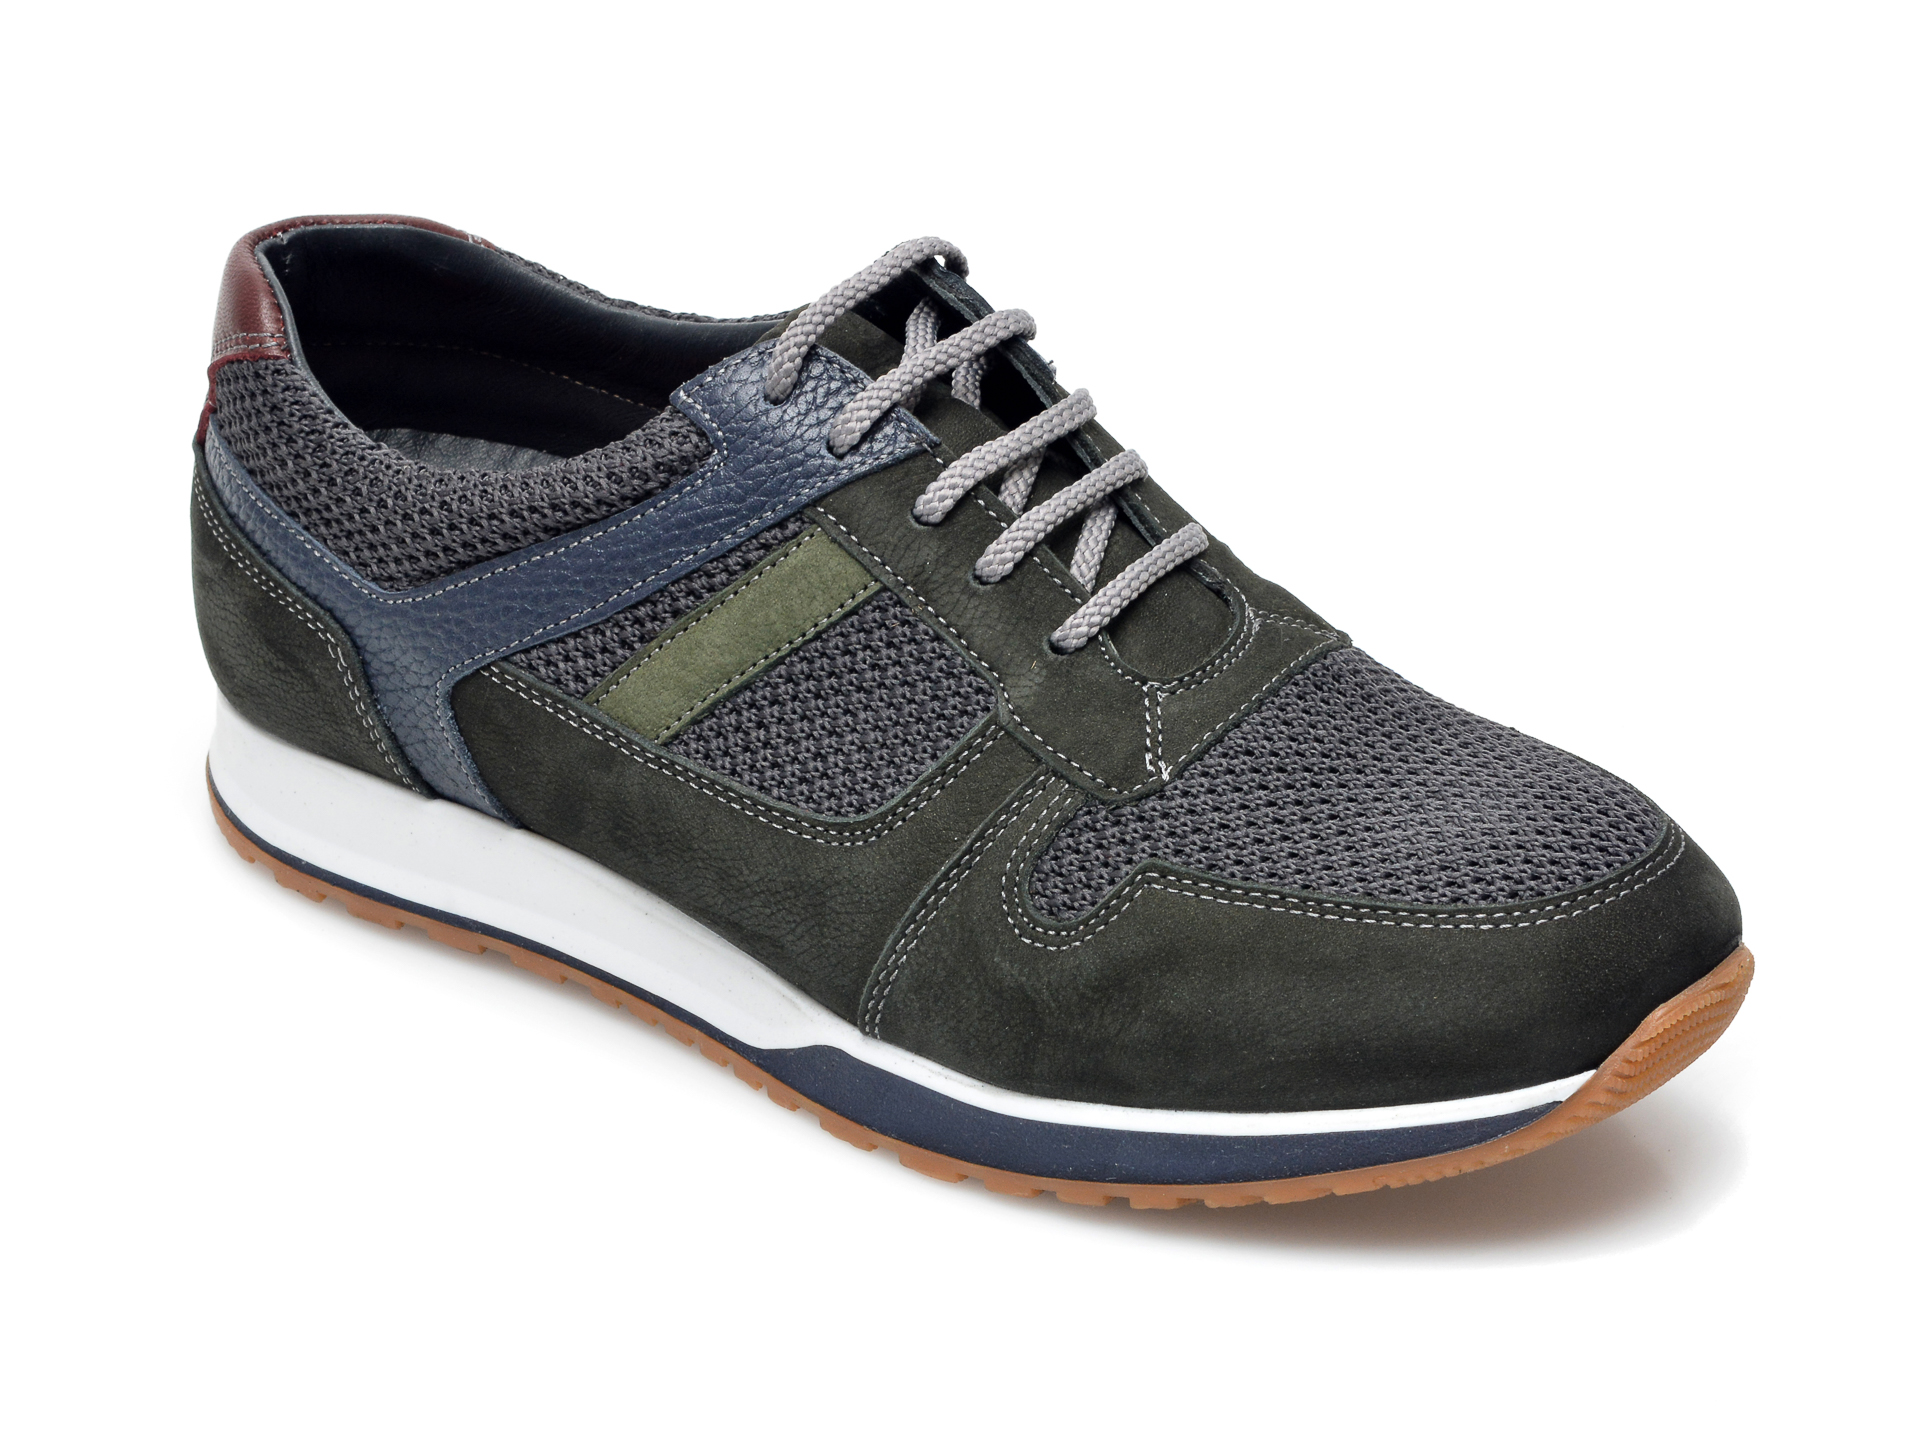 Pantofi Sport Otter Verzi, 81101, Din Material Textil Si Piele Intoarsa